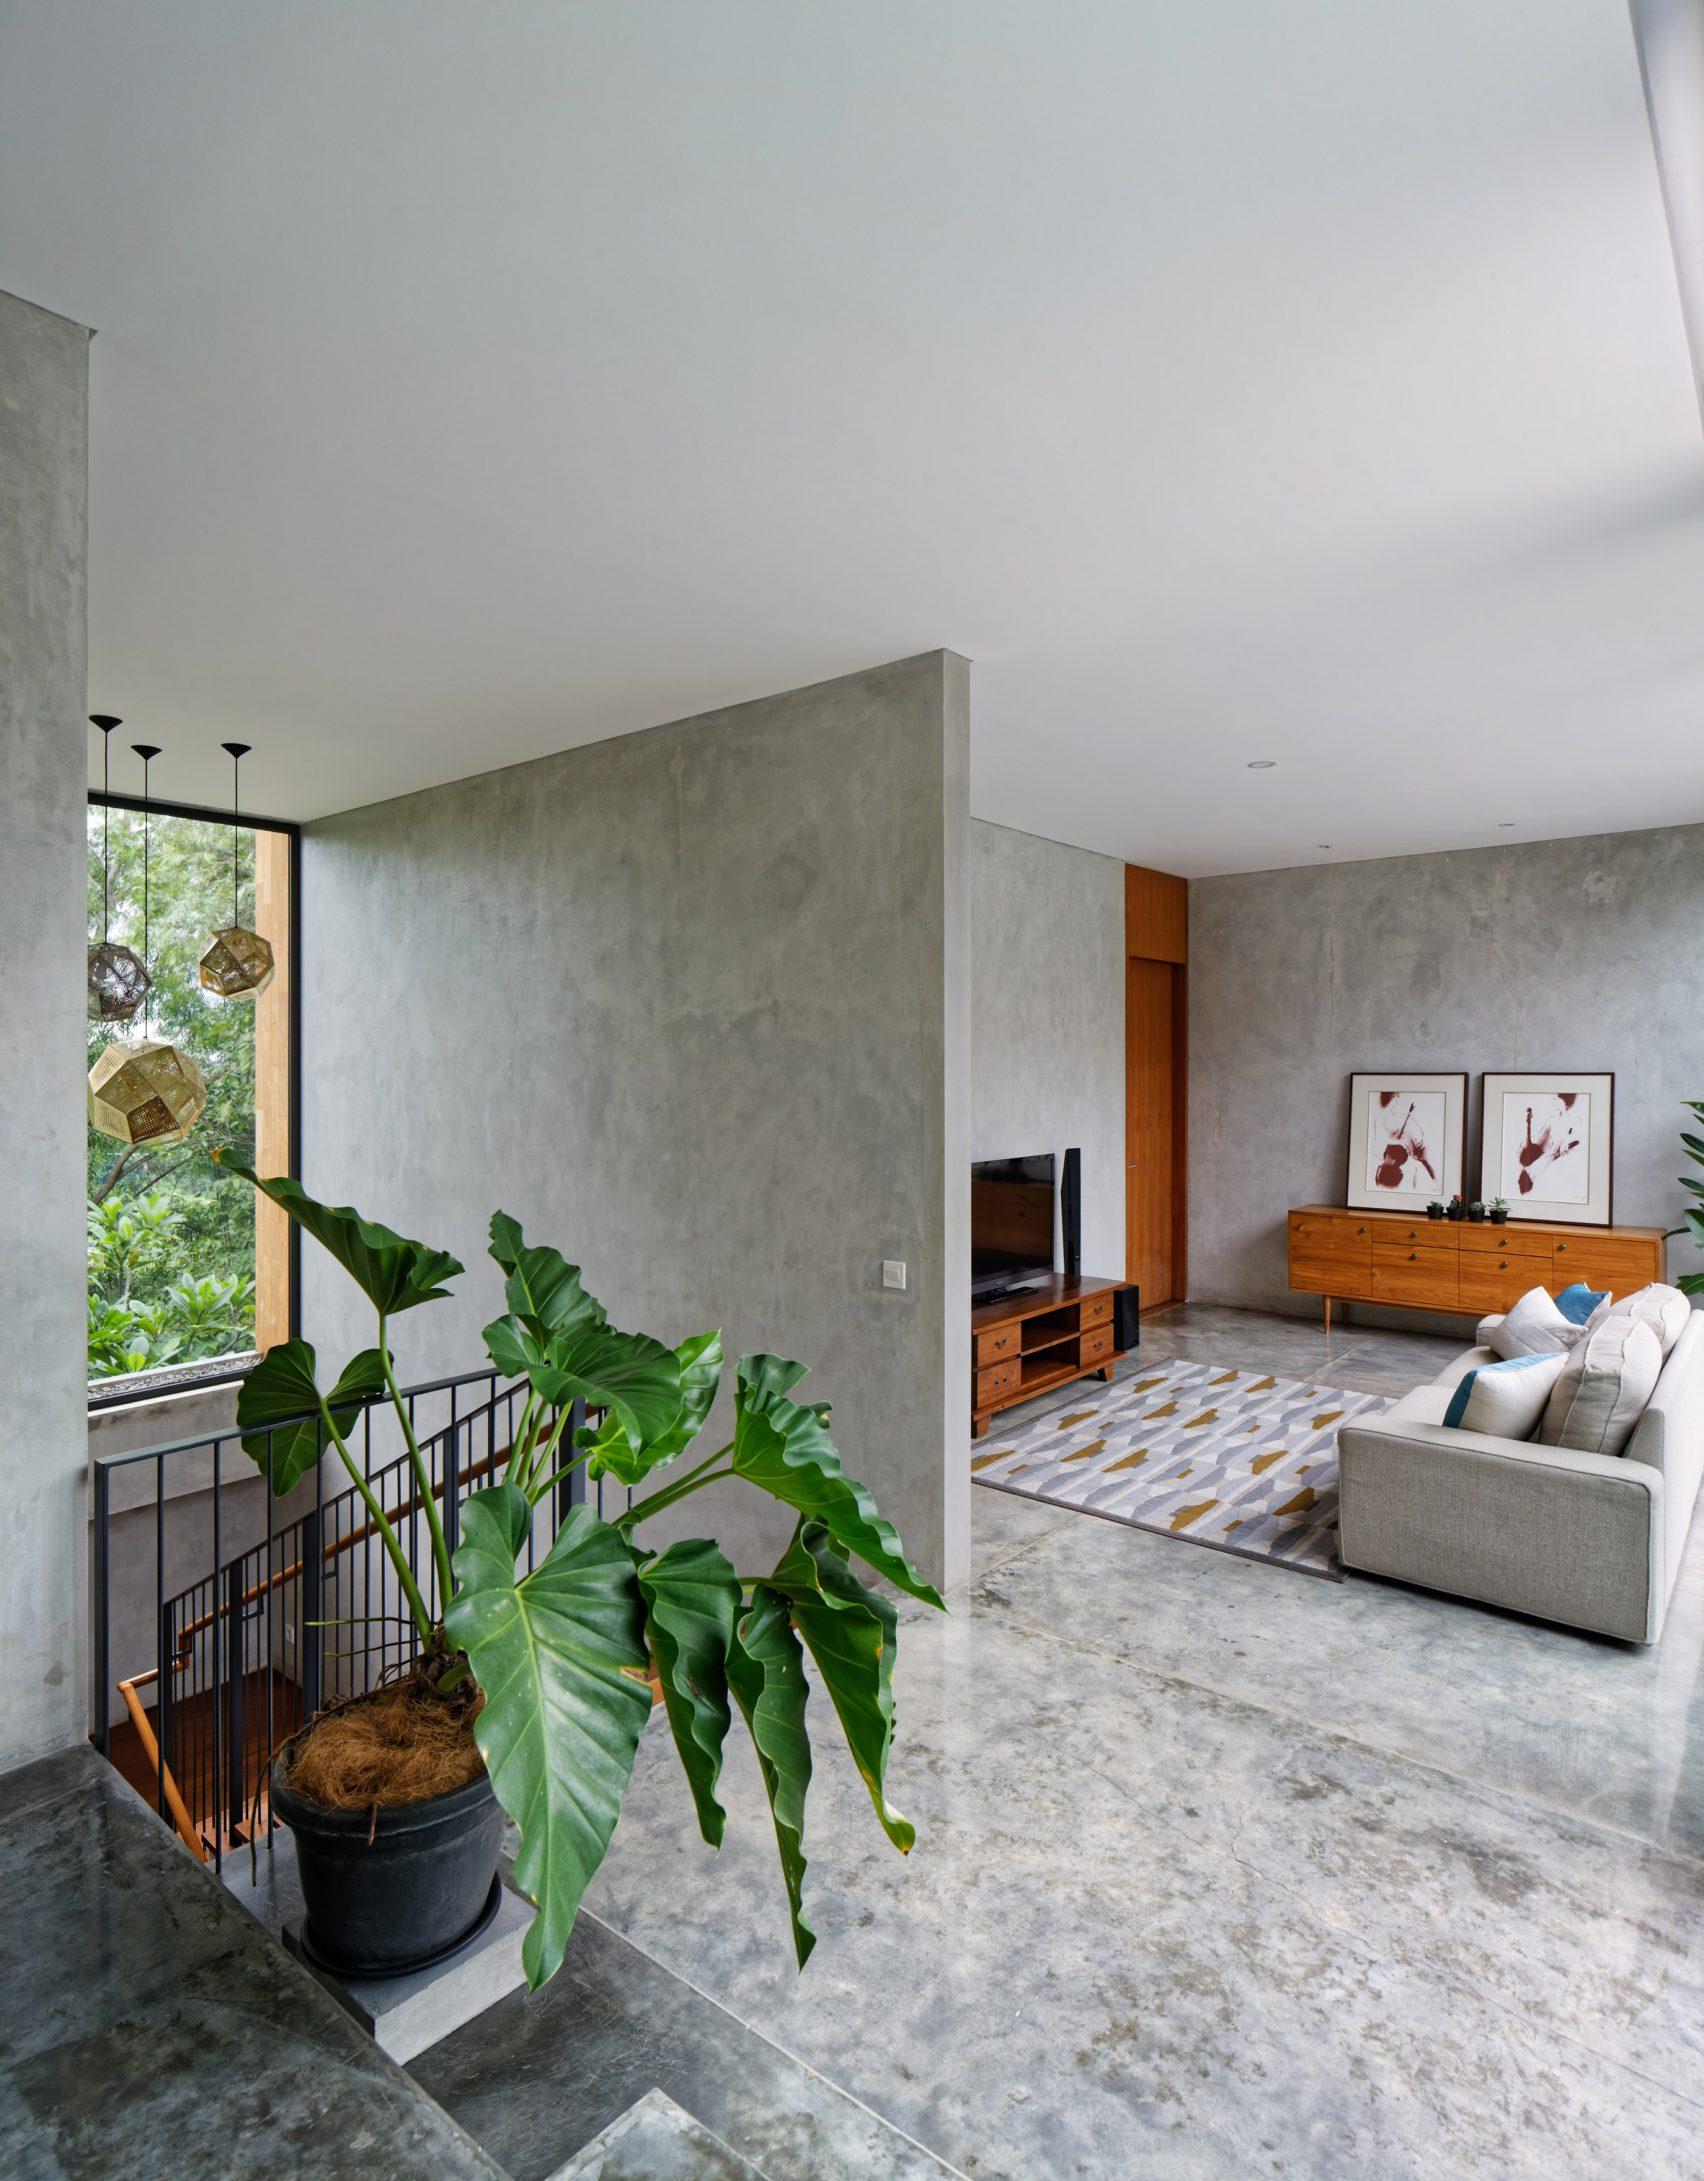 house-inside-outside-tamara-wibowo-architecture-residential-indonesia_dezeen_2364_col_20-1704x2181.jpg